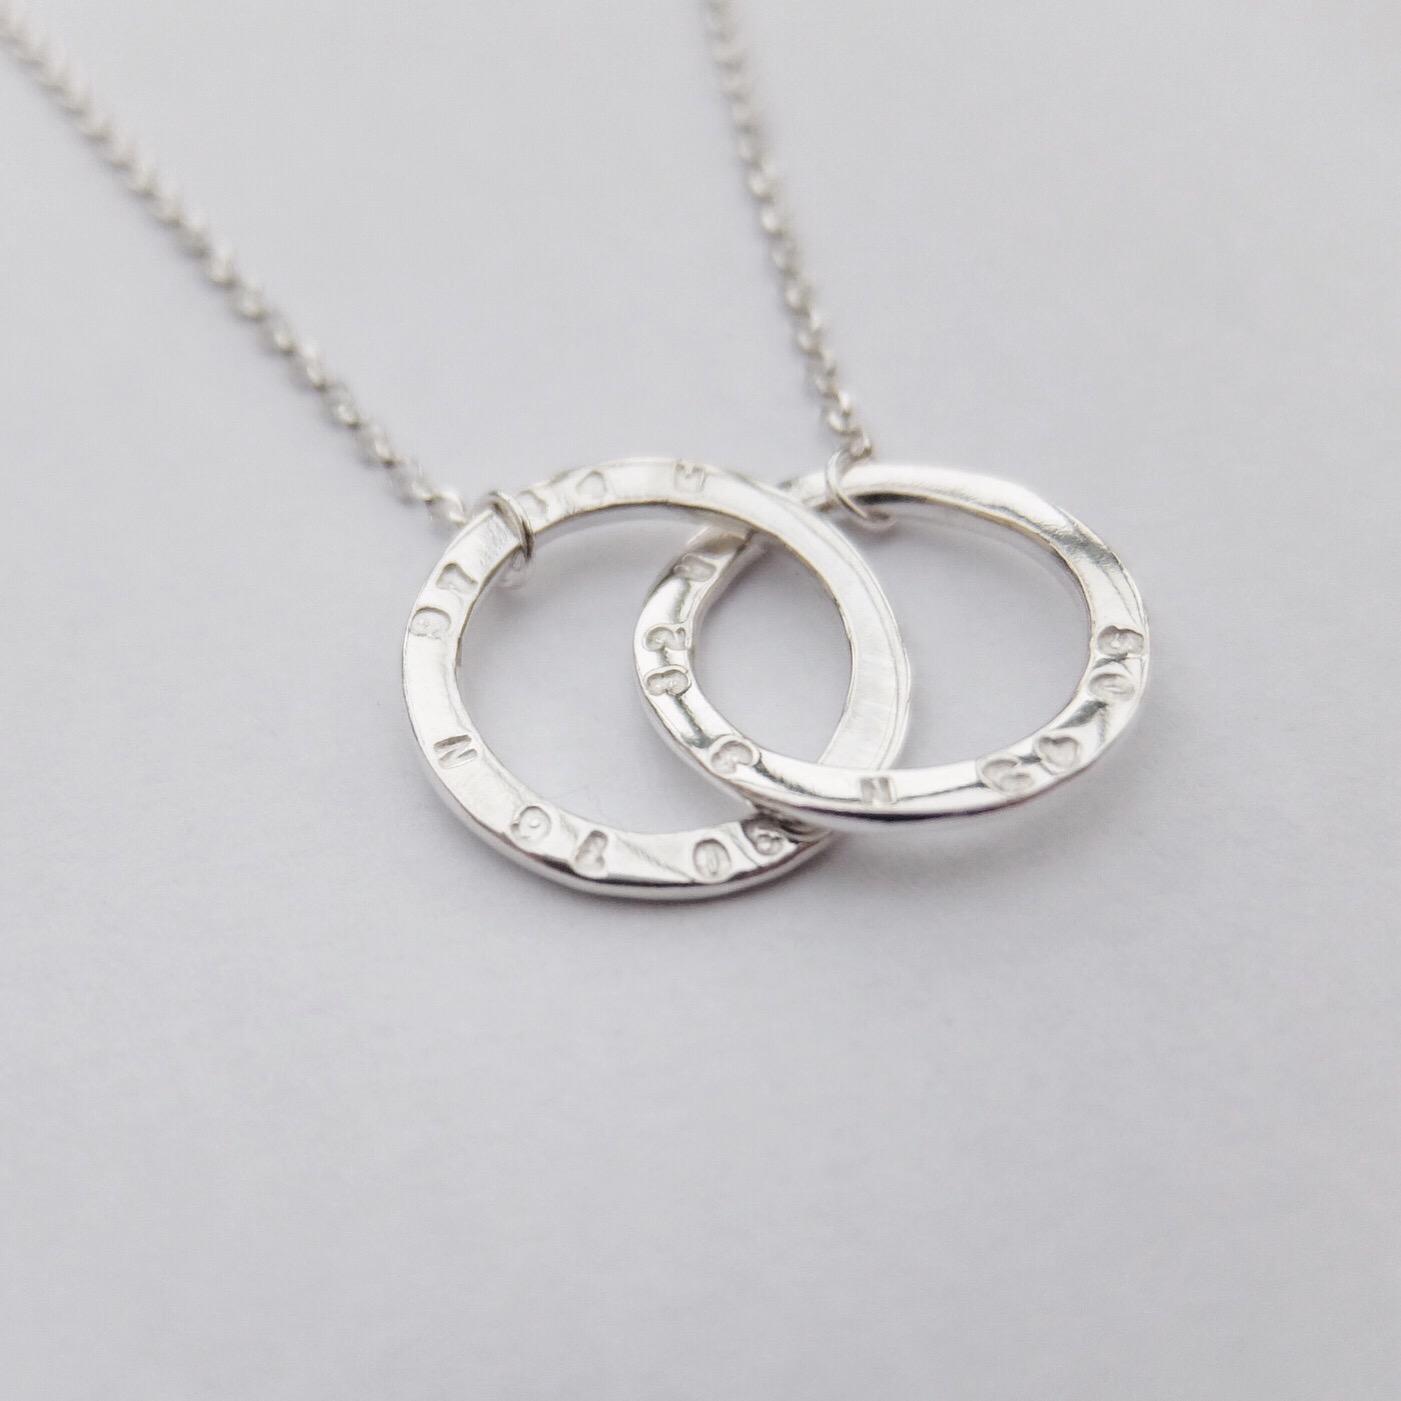 co ordinates necklace sterling silver circle pendant handmade devon uk jasmine bowden .jpg